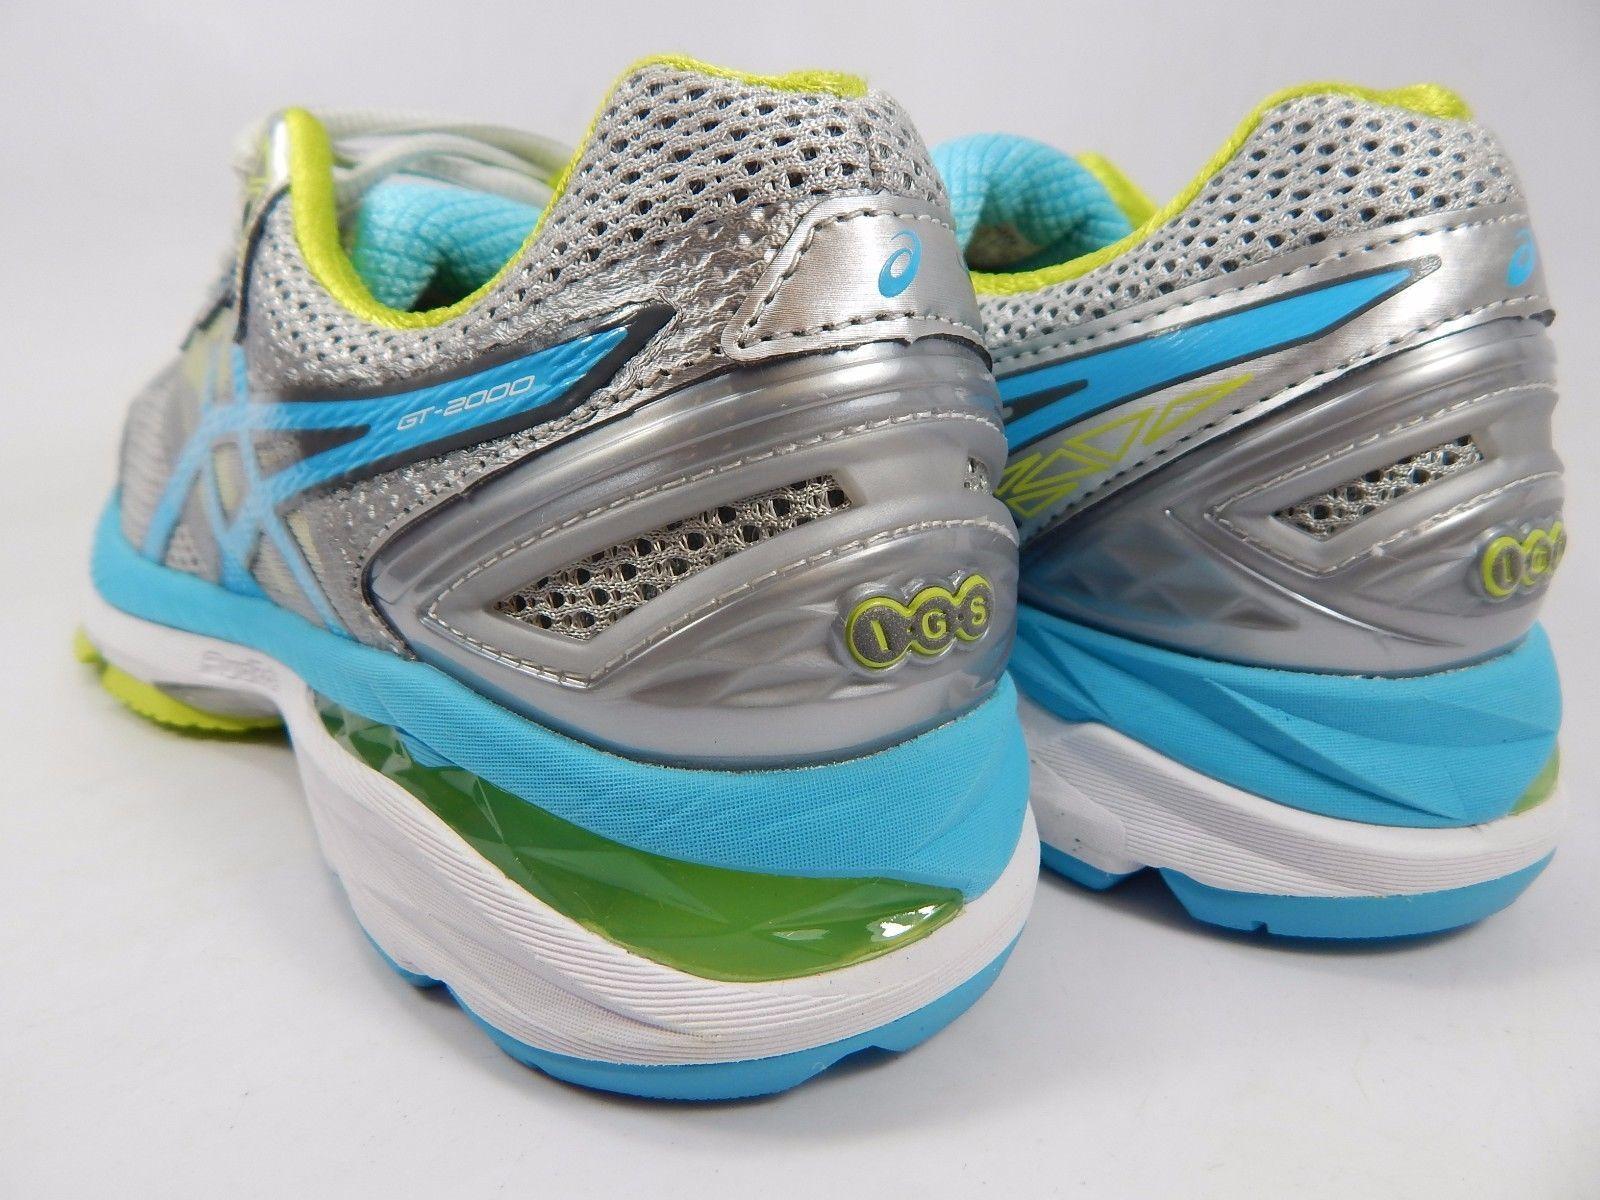 Asics GT 2000 V 4 Women's Running Shoes Size US 7.5 M (B) EU 39 Silver T656N